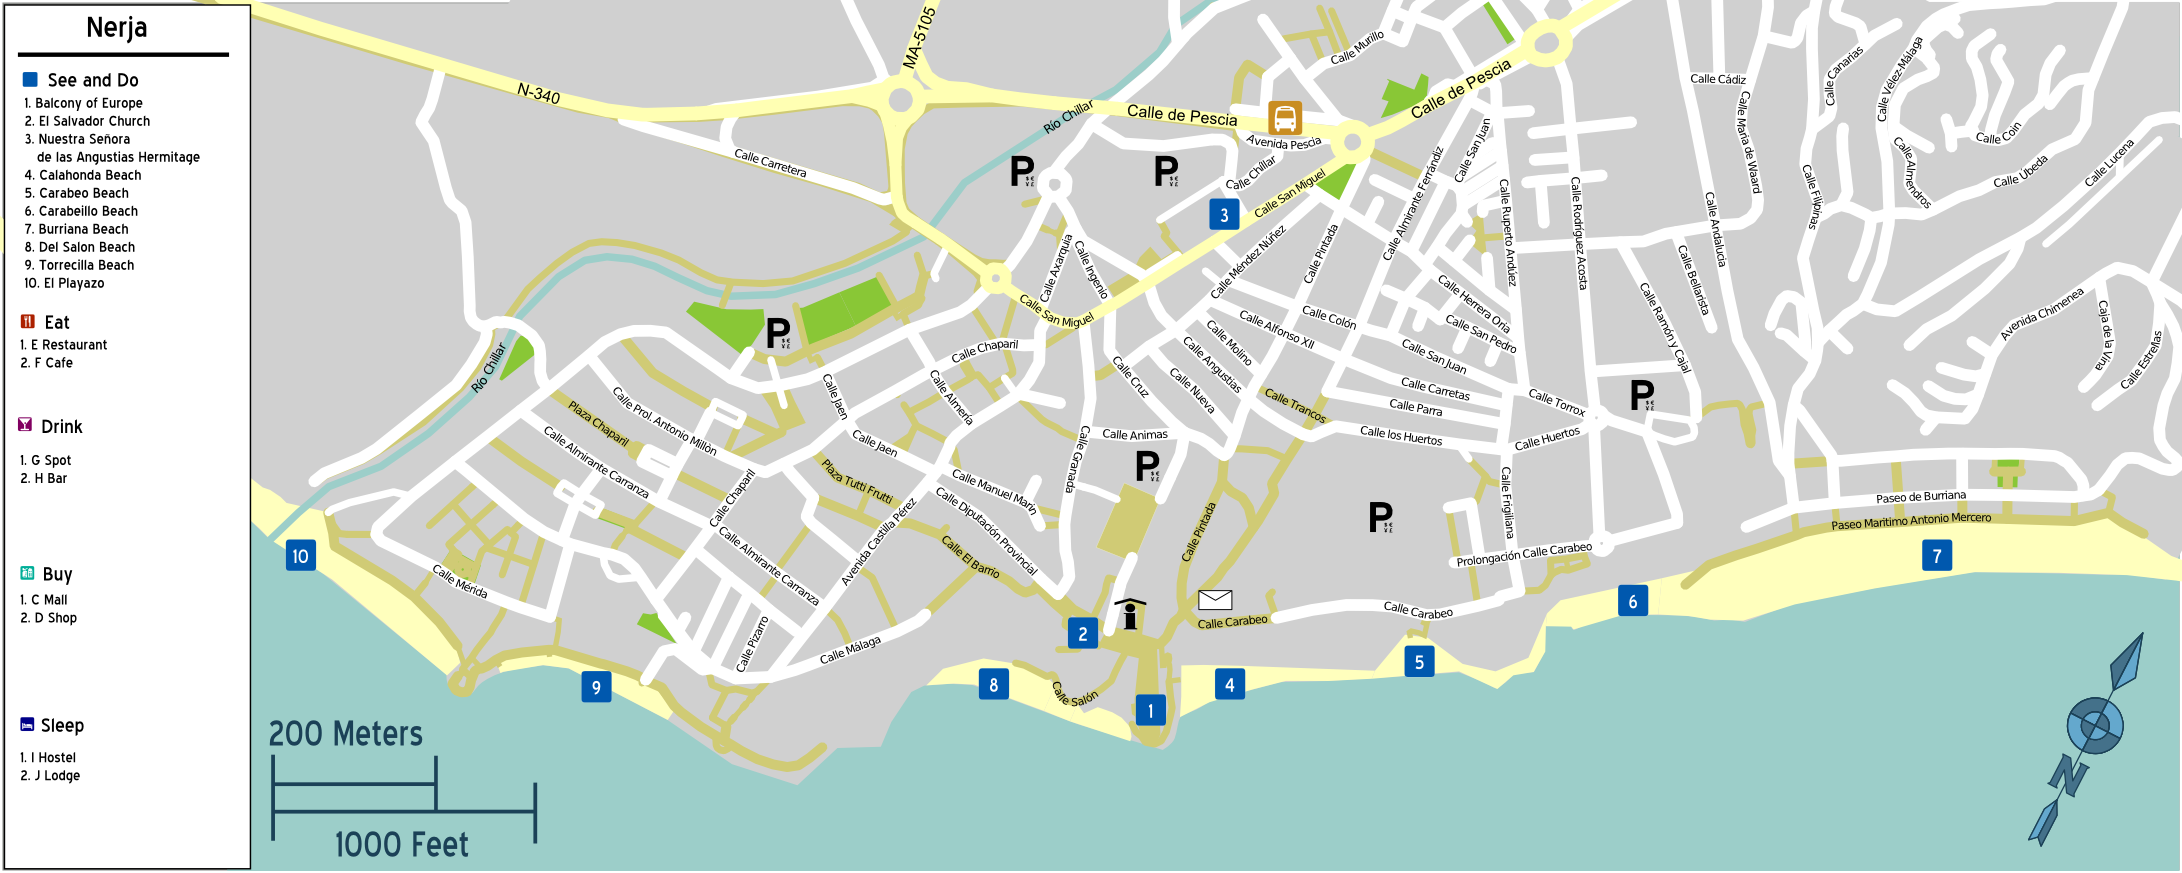 Map Of Nerja File:Nerja map.png   Wikimedia Commons Map Of Nerja